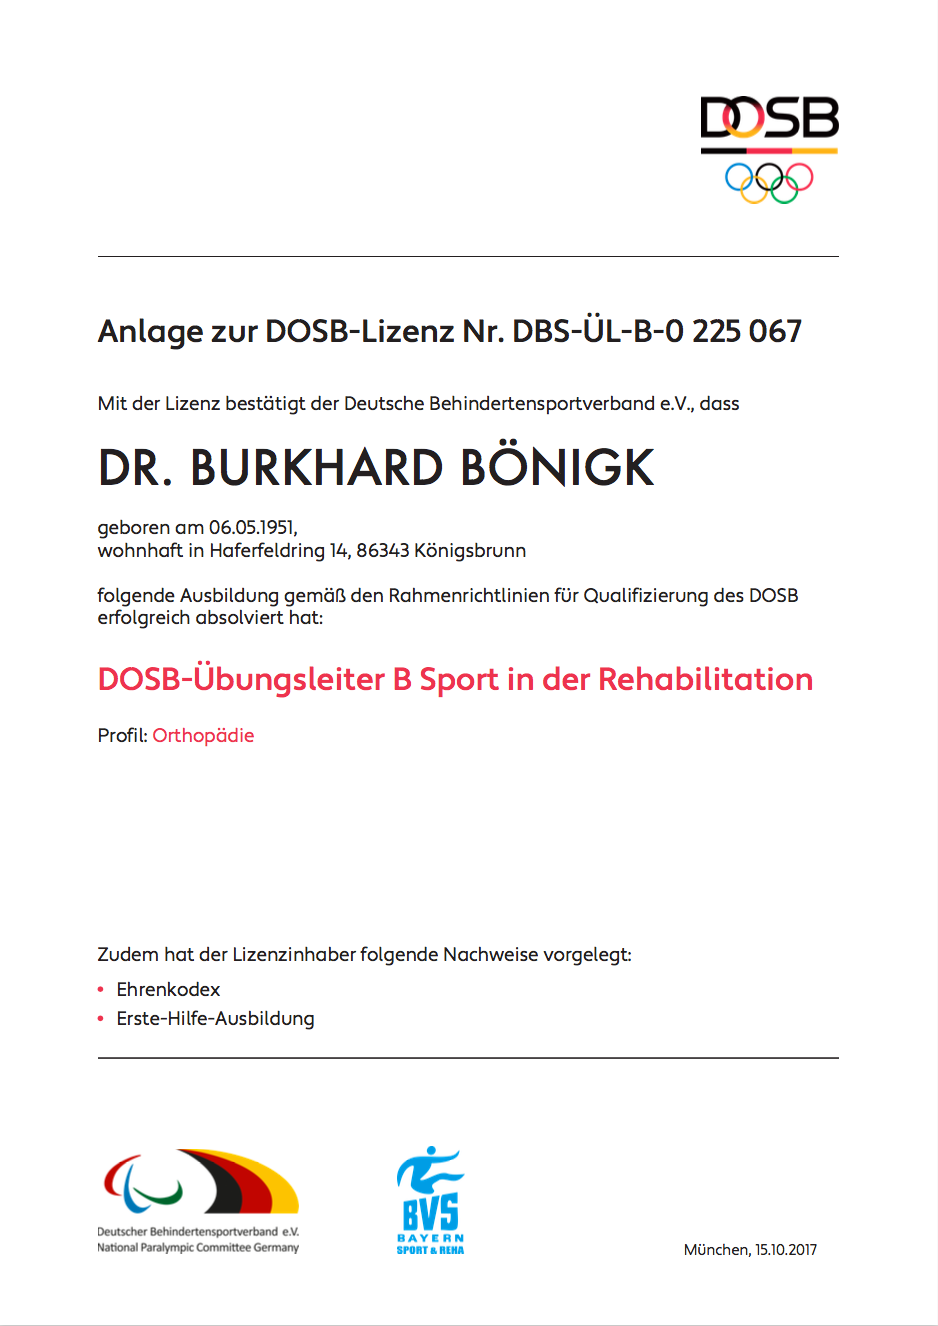 Dr. Burkhard Boenigk Übungsleiter-B Reha-Sport DOSB® Lizenz 2/2